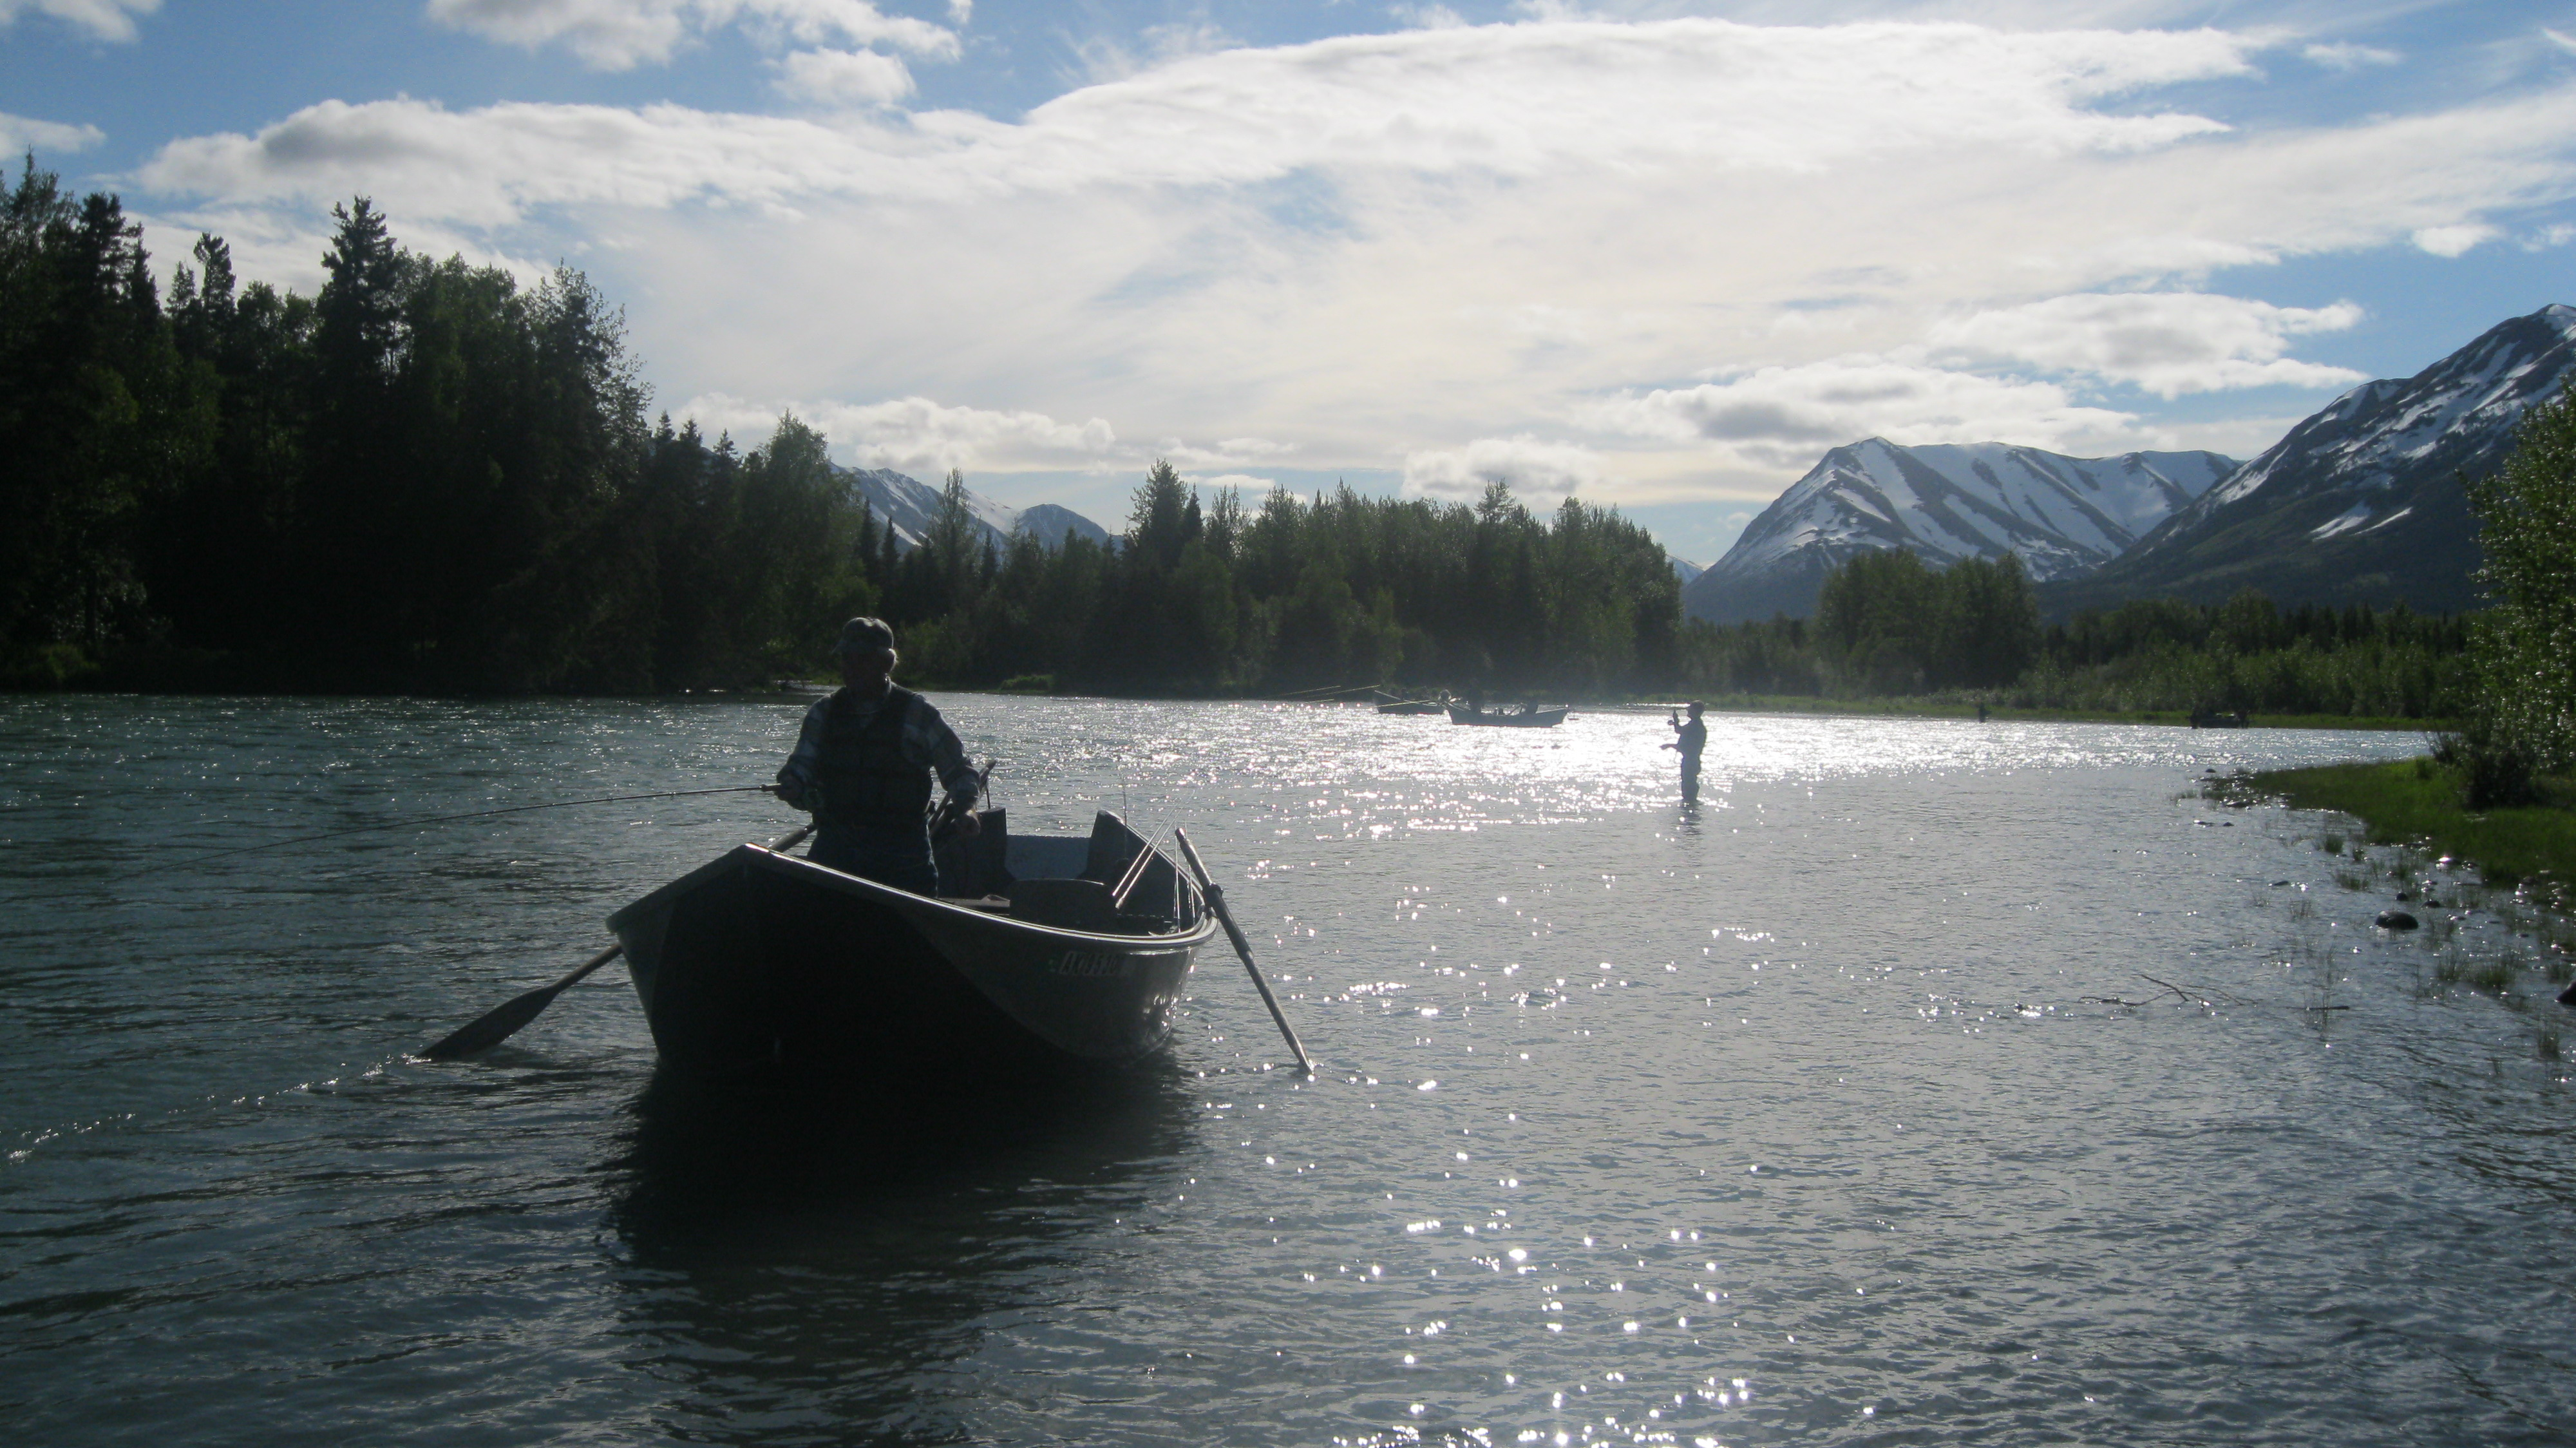 Kenai river fly fishing guided alaska fly fishing for Kenai river fishing lodges